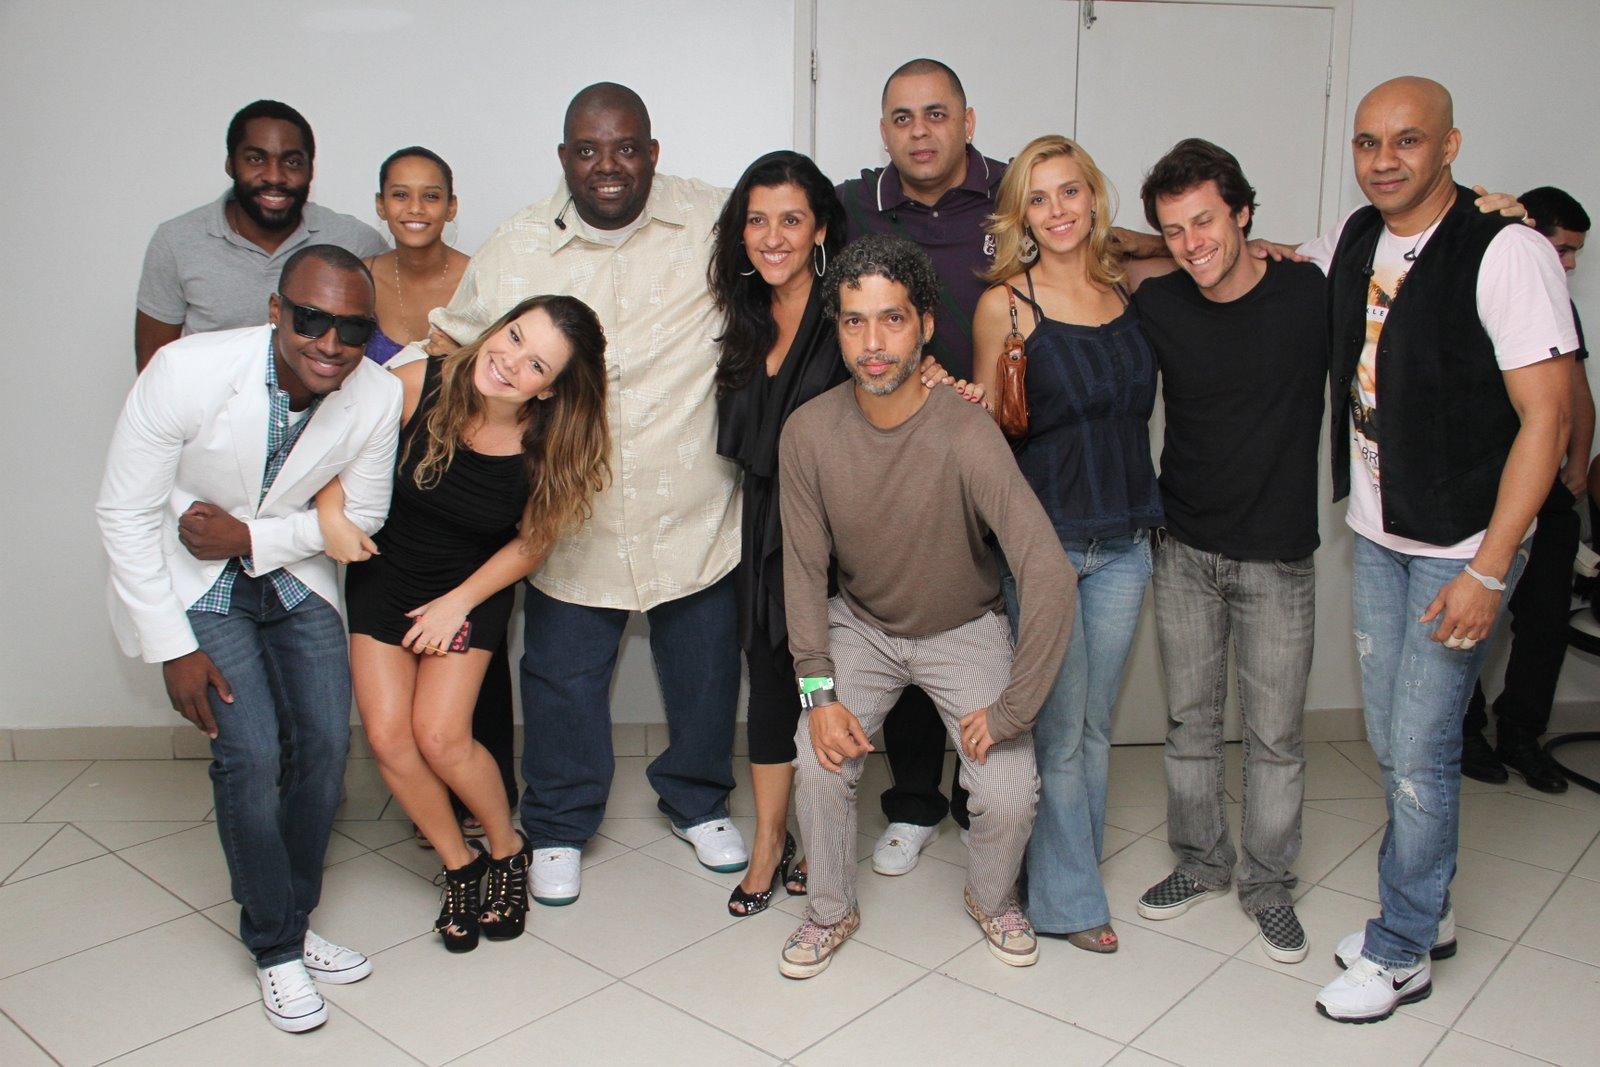 Exaltasamba recebe famosos no camarim após show no Rio